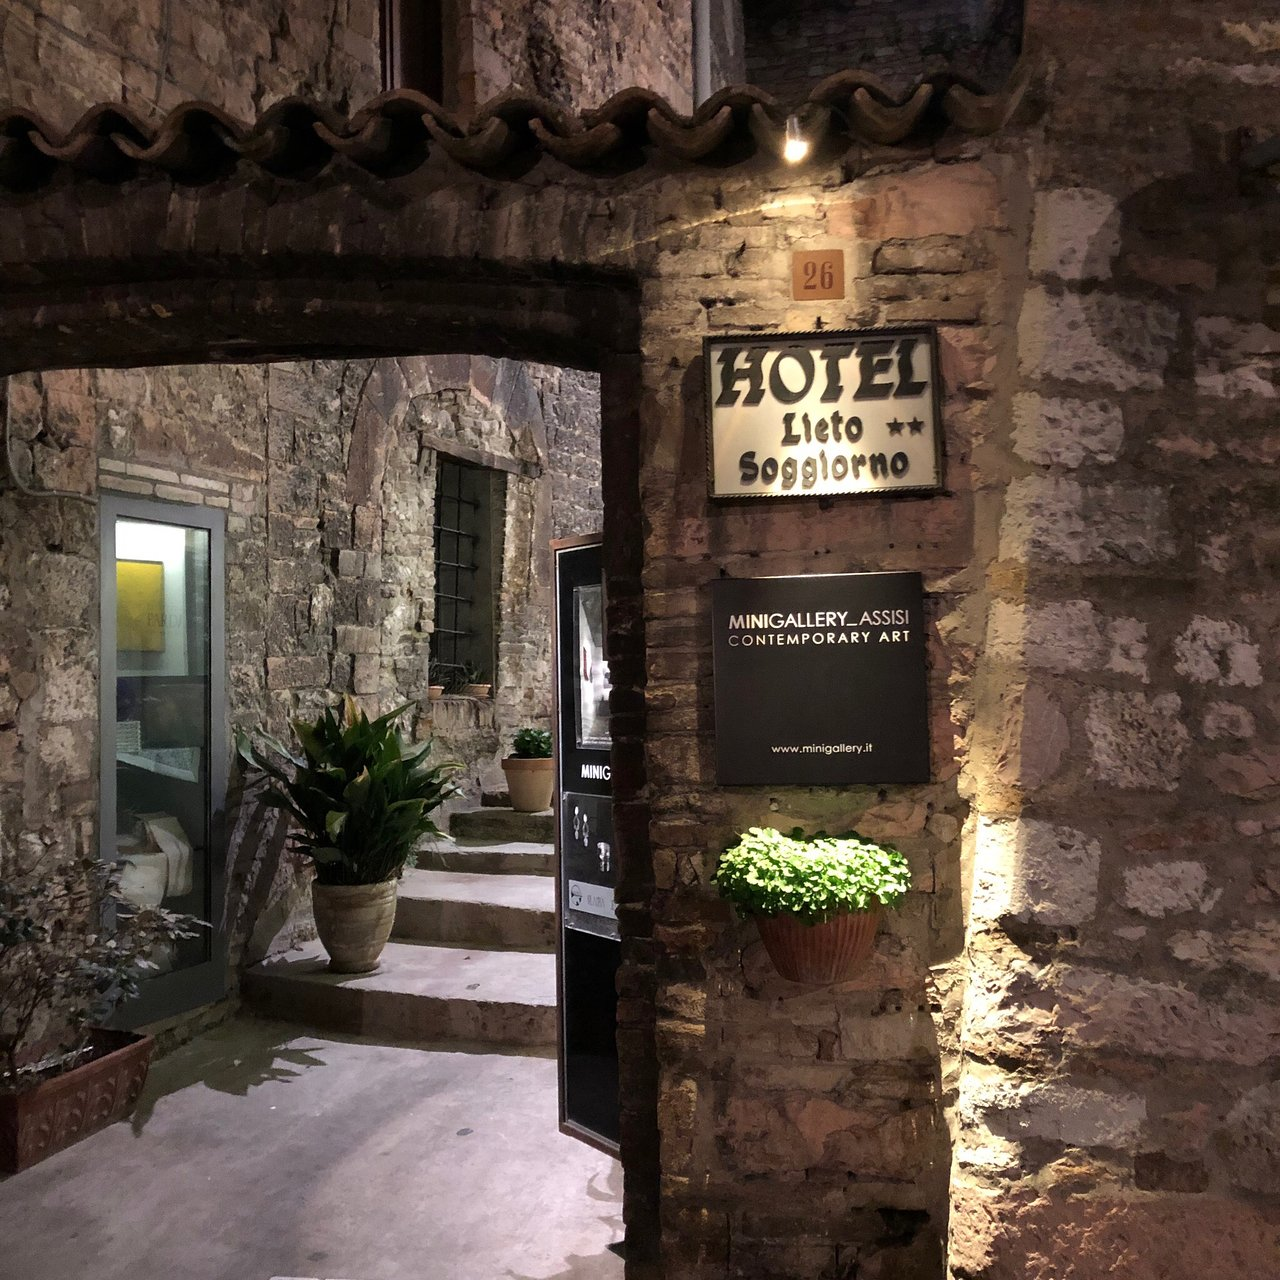 HOTEL LIETO SOGGIORNO - UPDATED 2019 B&B Reviews & Price ...